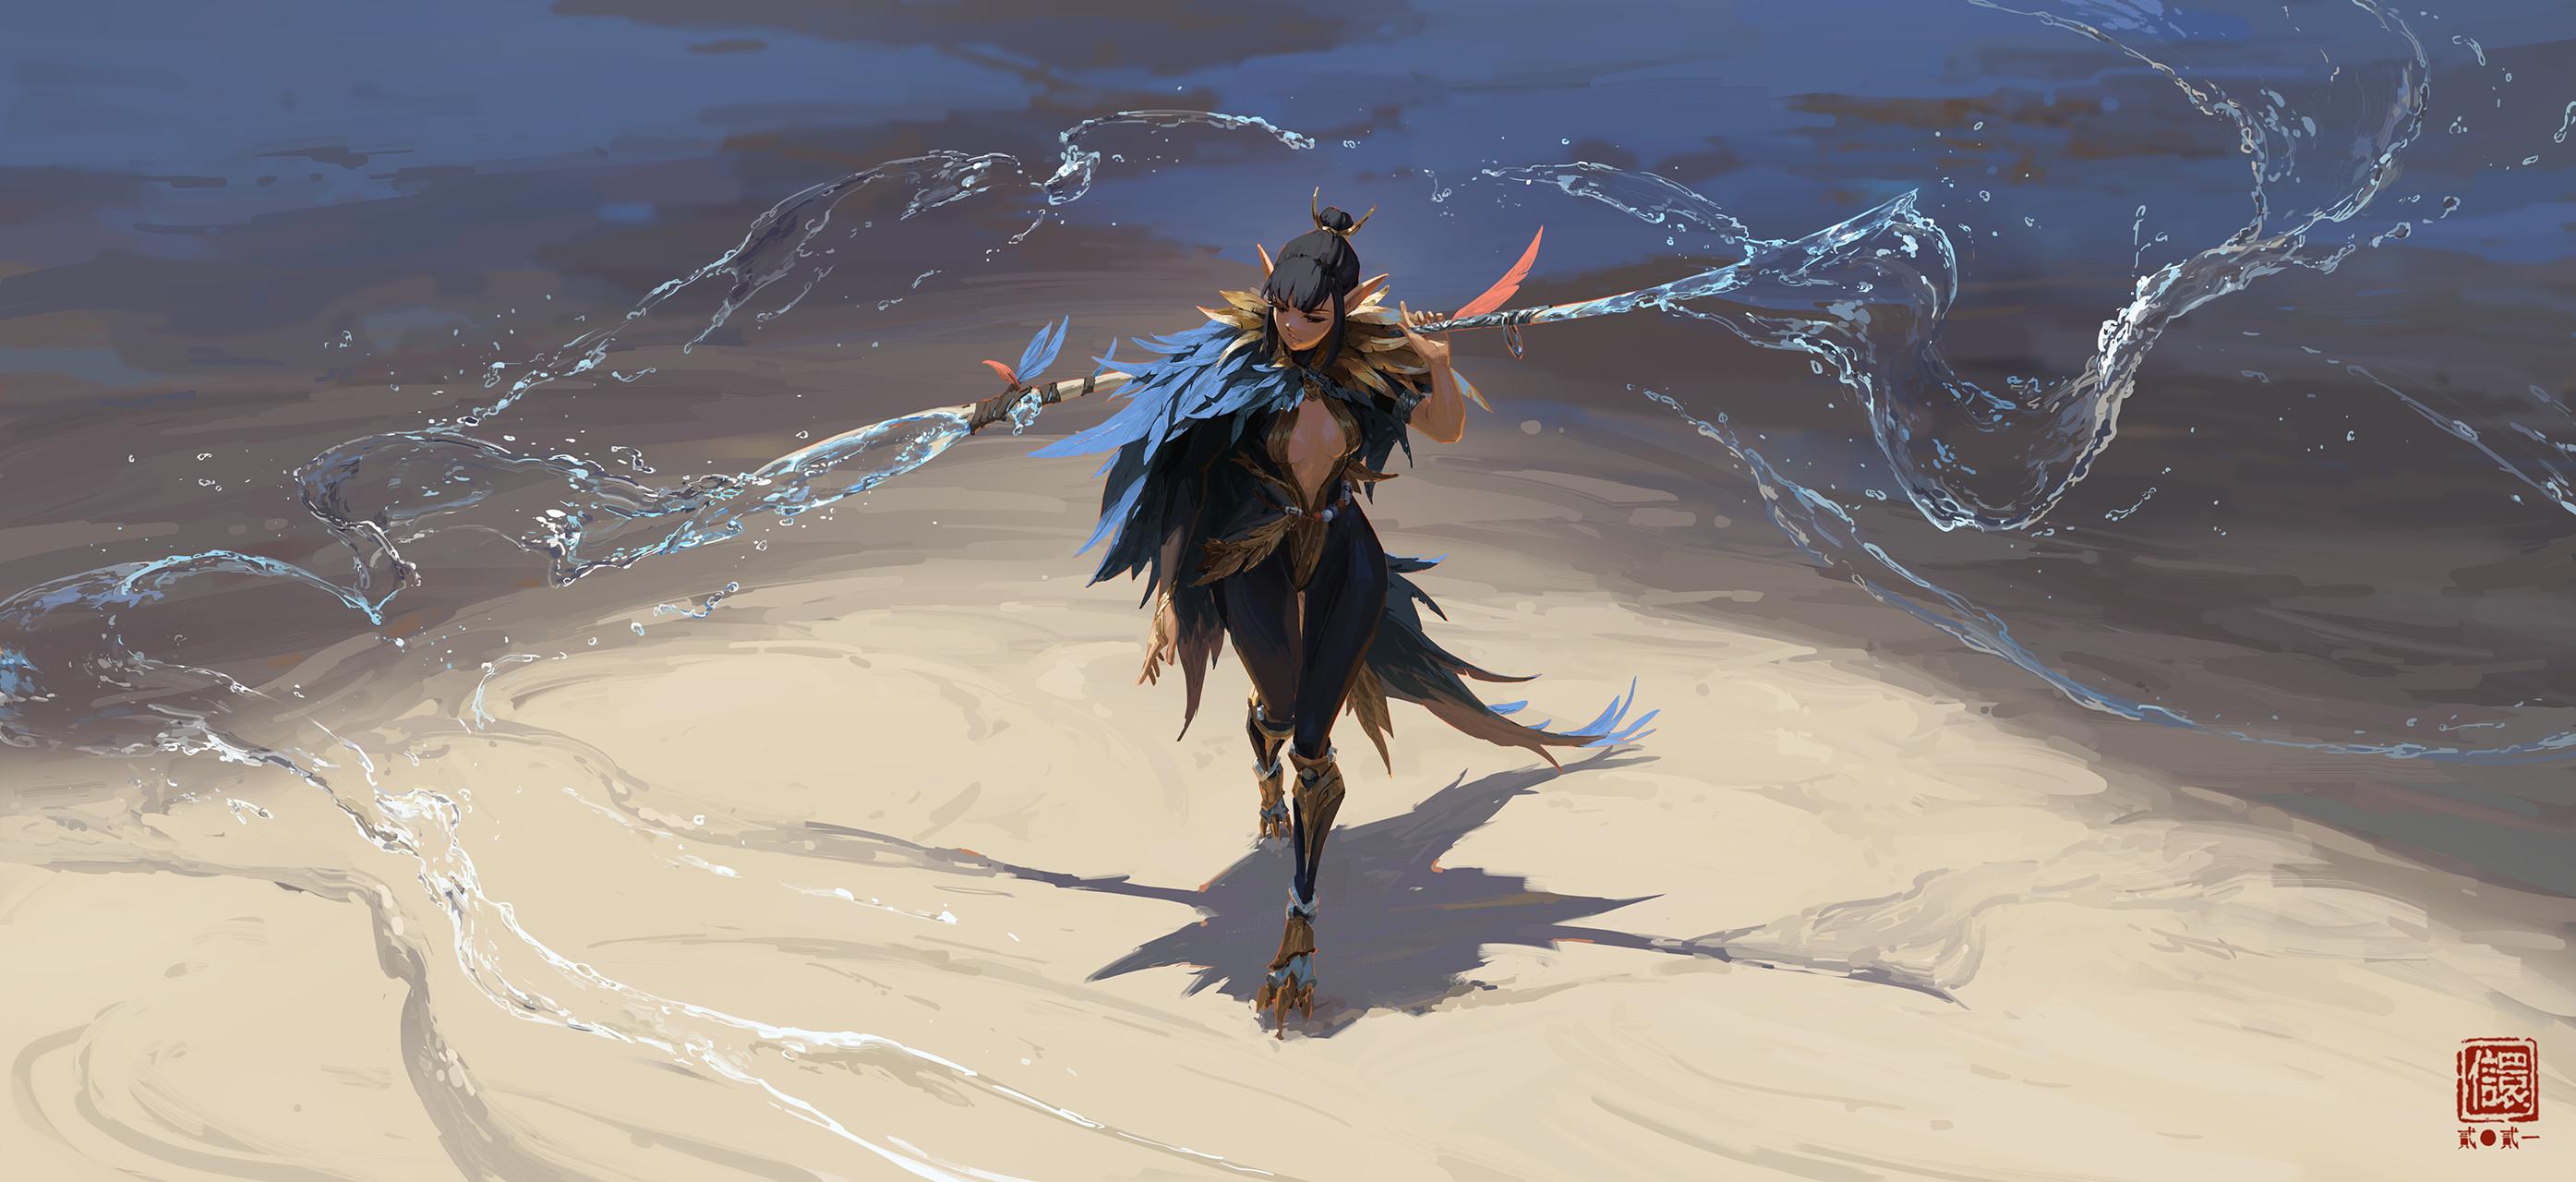 General 2790x1280 ArtStation Kan Liu women artwork digital art fantasy art fantasy girl